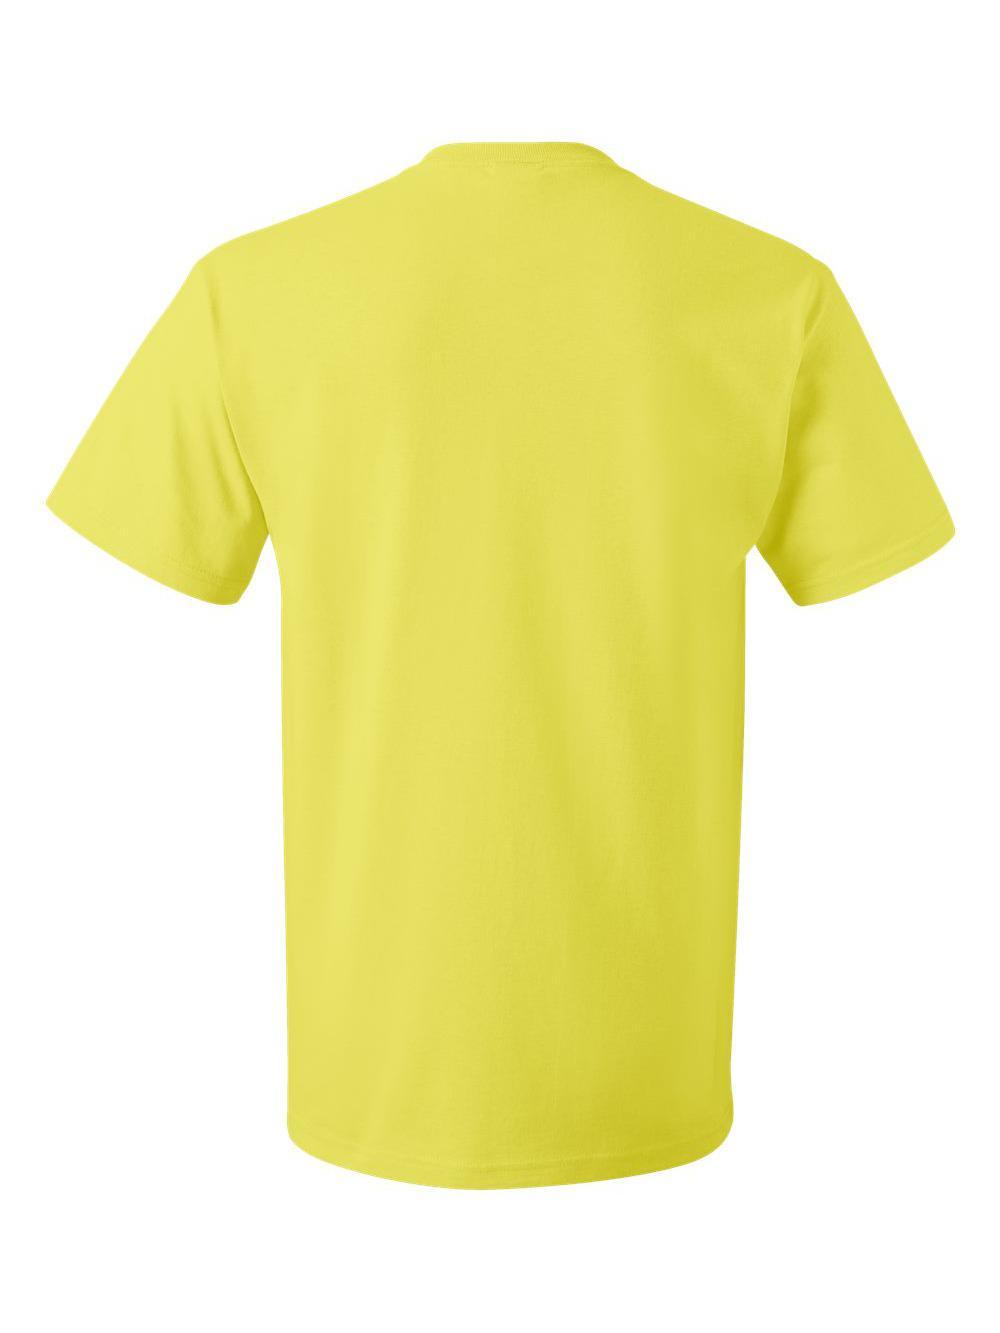 Fruit-of-the-Loom-HD-Cotton-Short-Sleeve-T-Shirt-3930R thumbnail 88